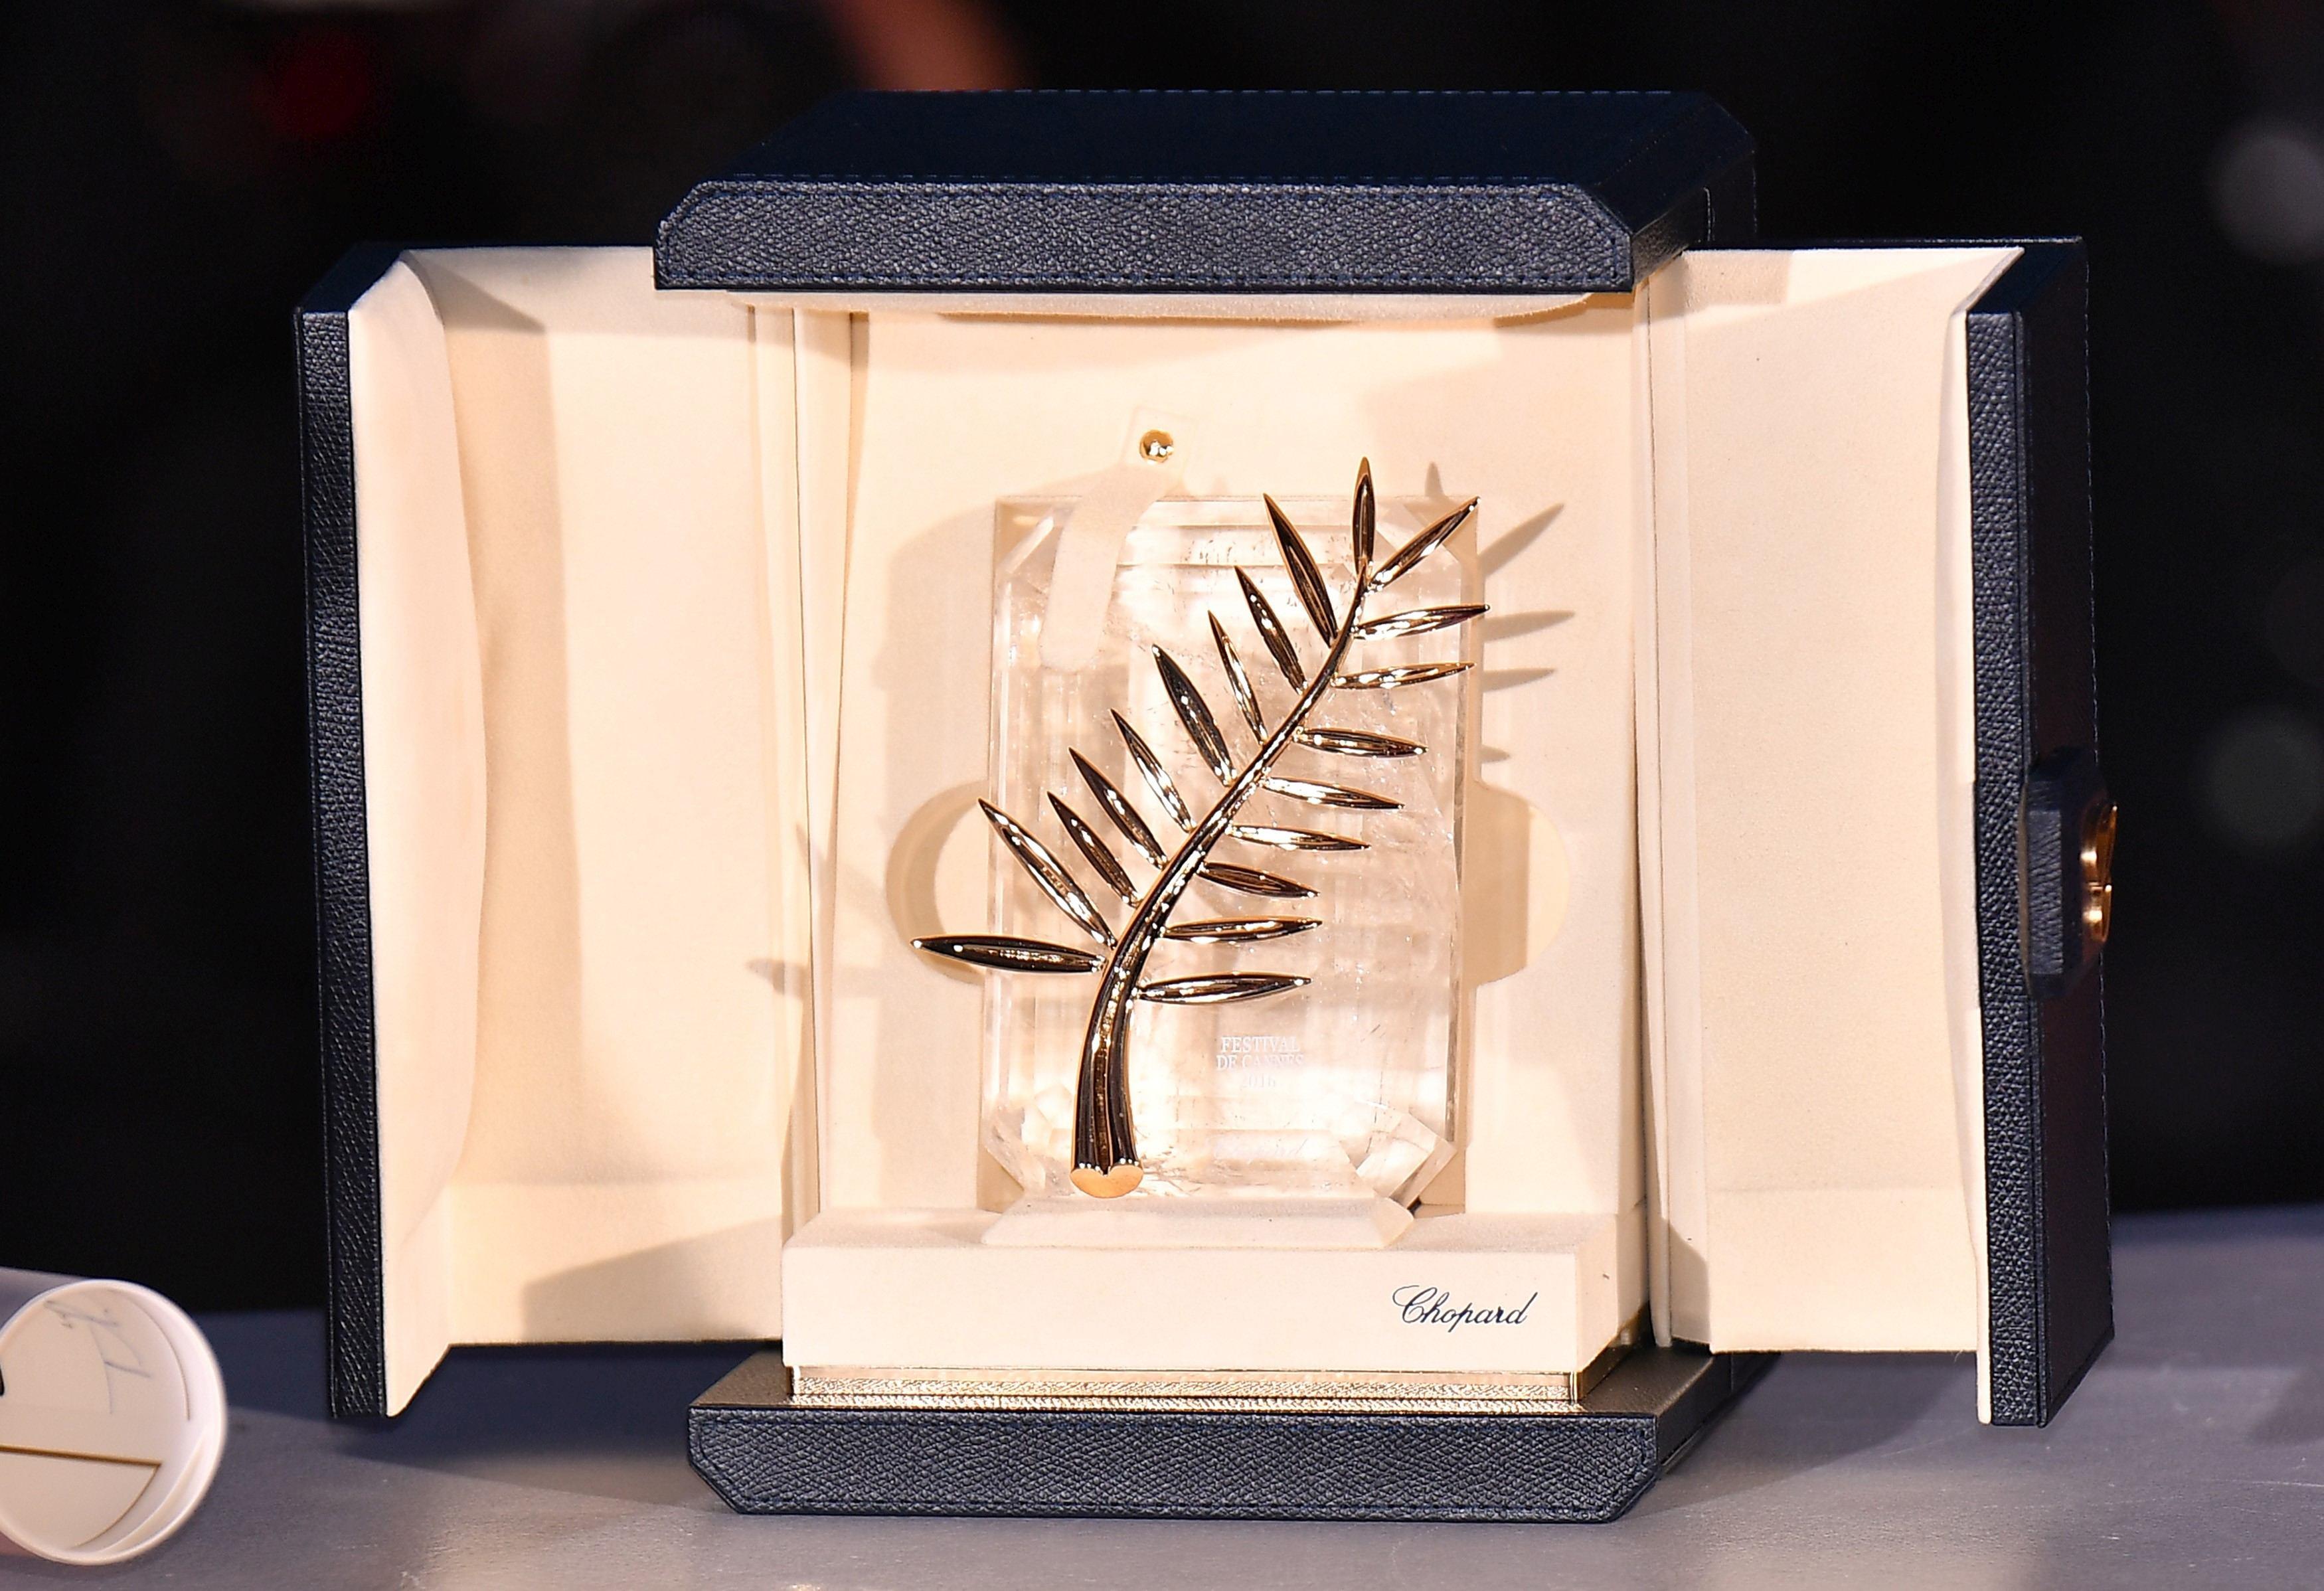 Palme d'Or (Golden Palm) Trofeul Festivalului de Film de la Cannes 2017